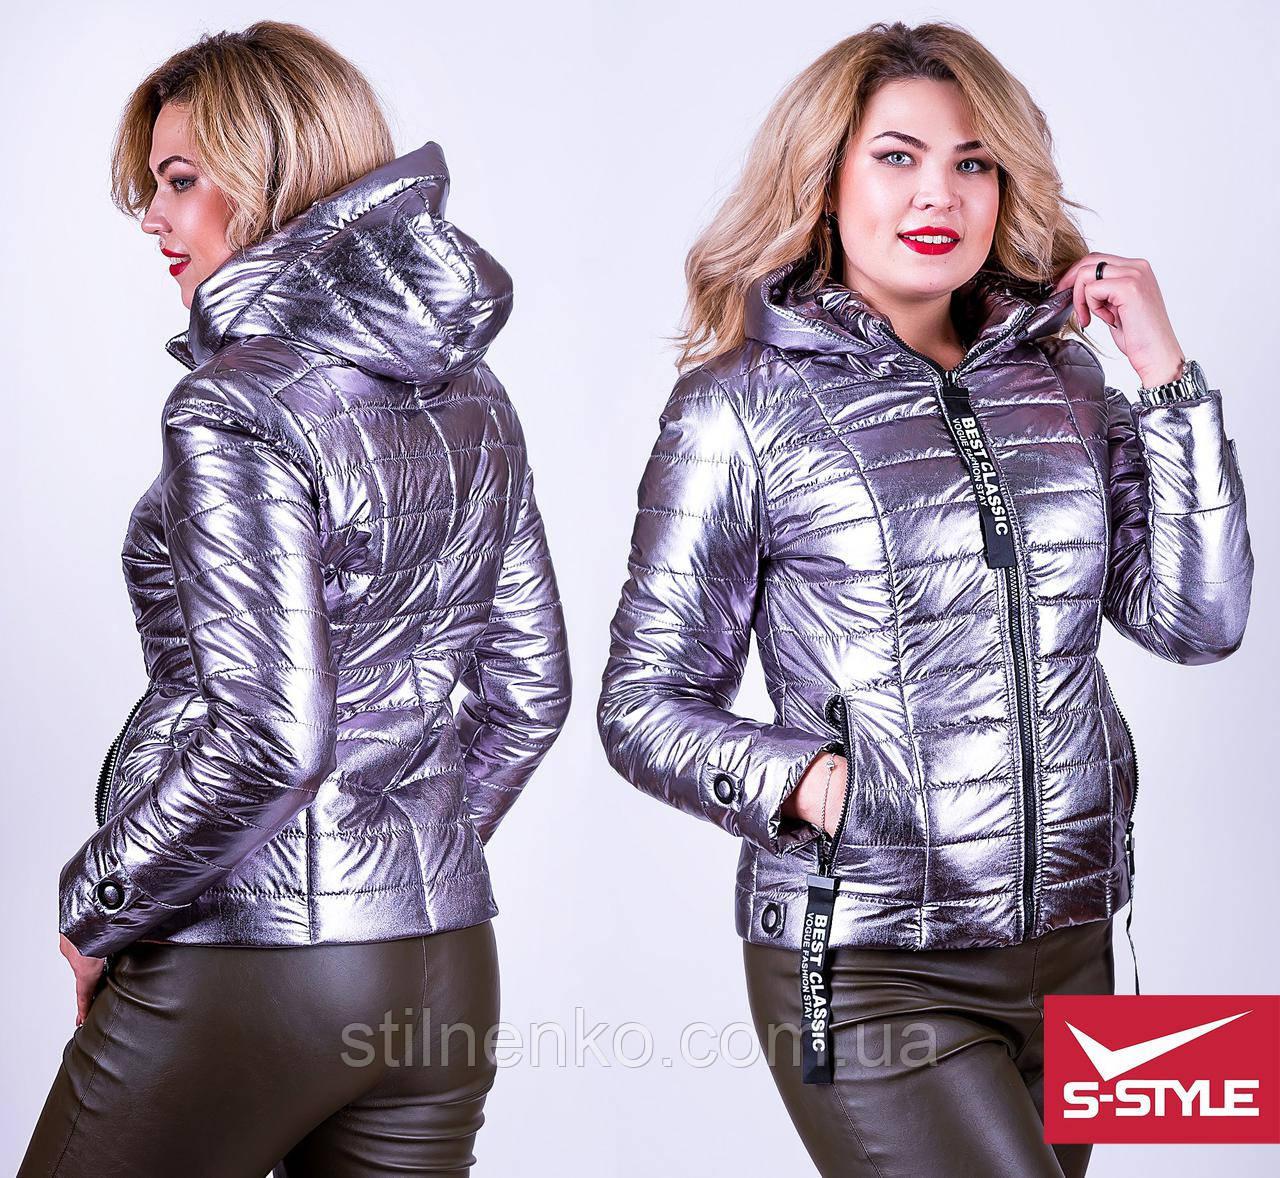 ff98eab7861 Стильная женская куртка